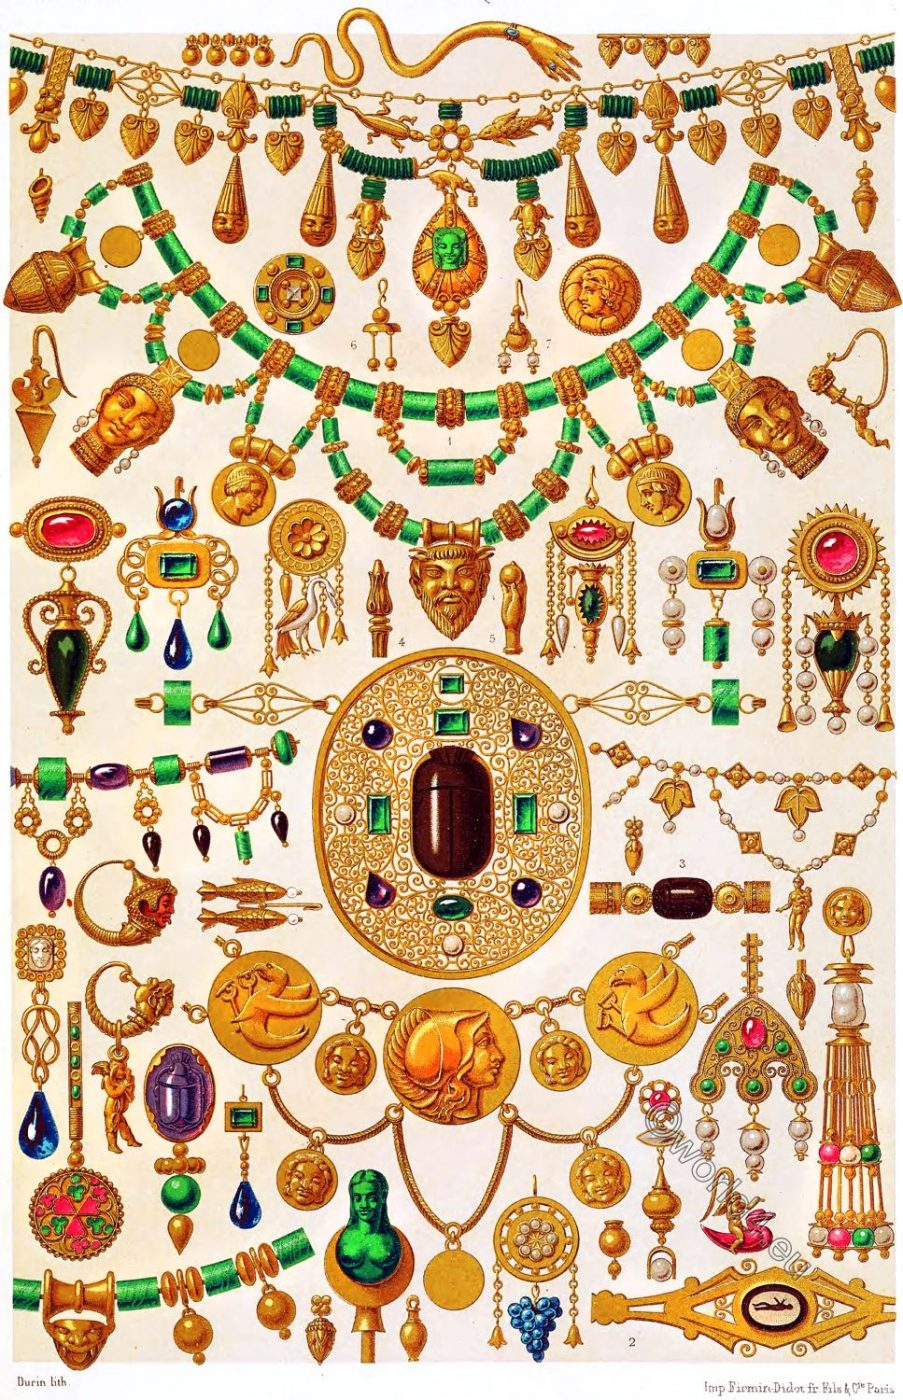 Auguste Racinet, etruscan, art, jewels, civilization, ancient, Italy